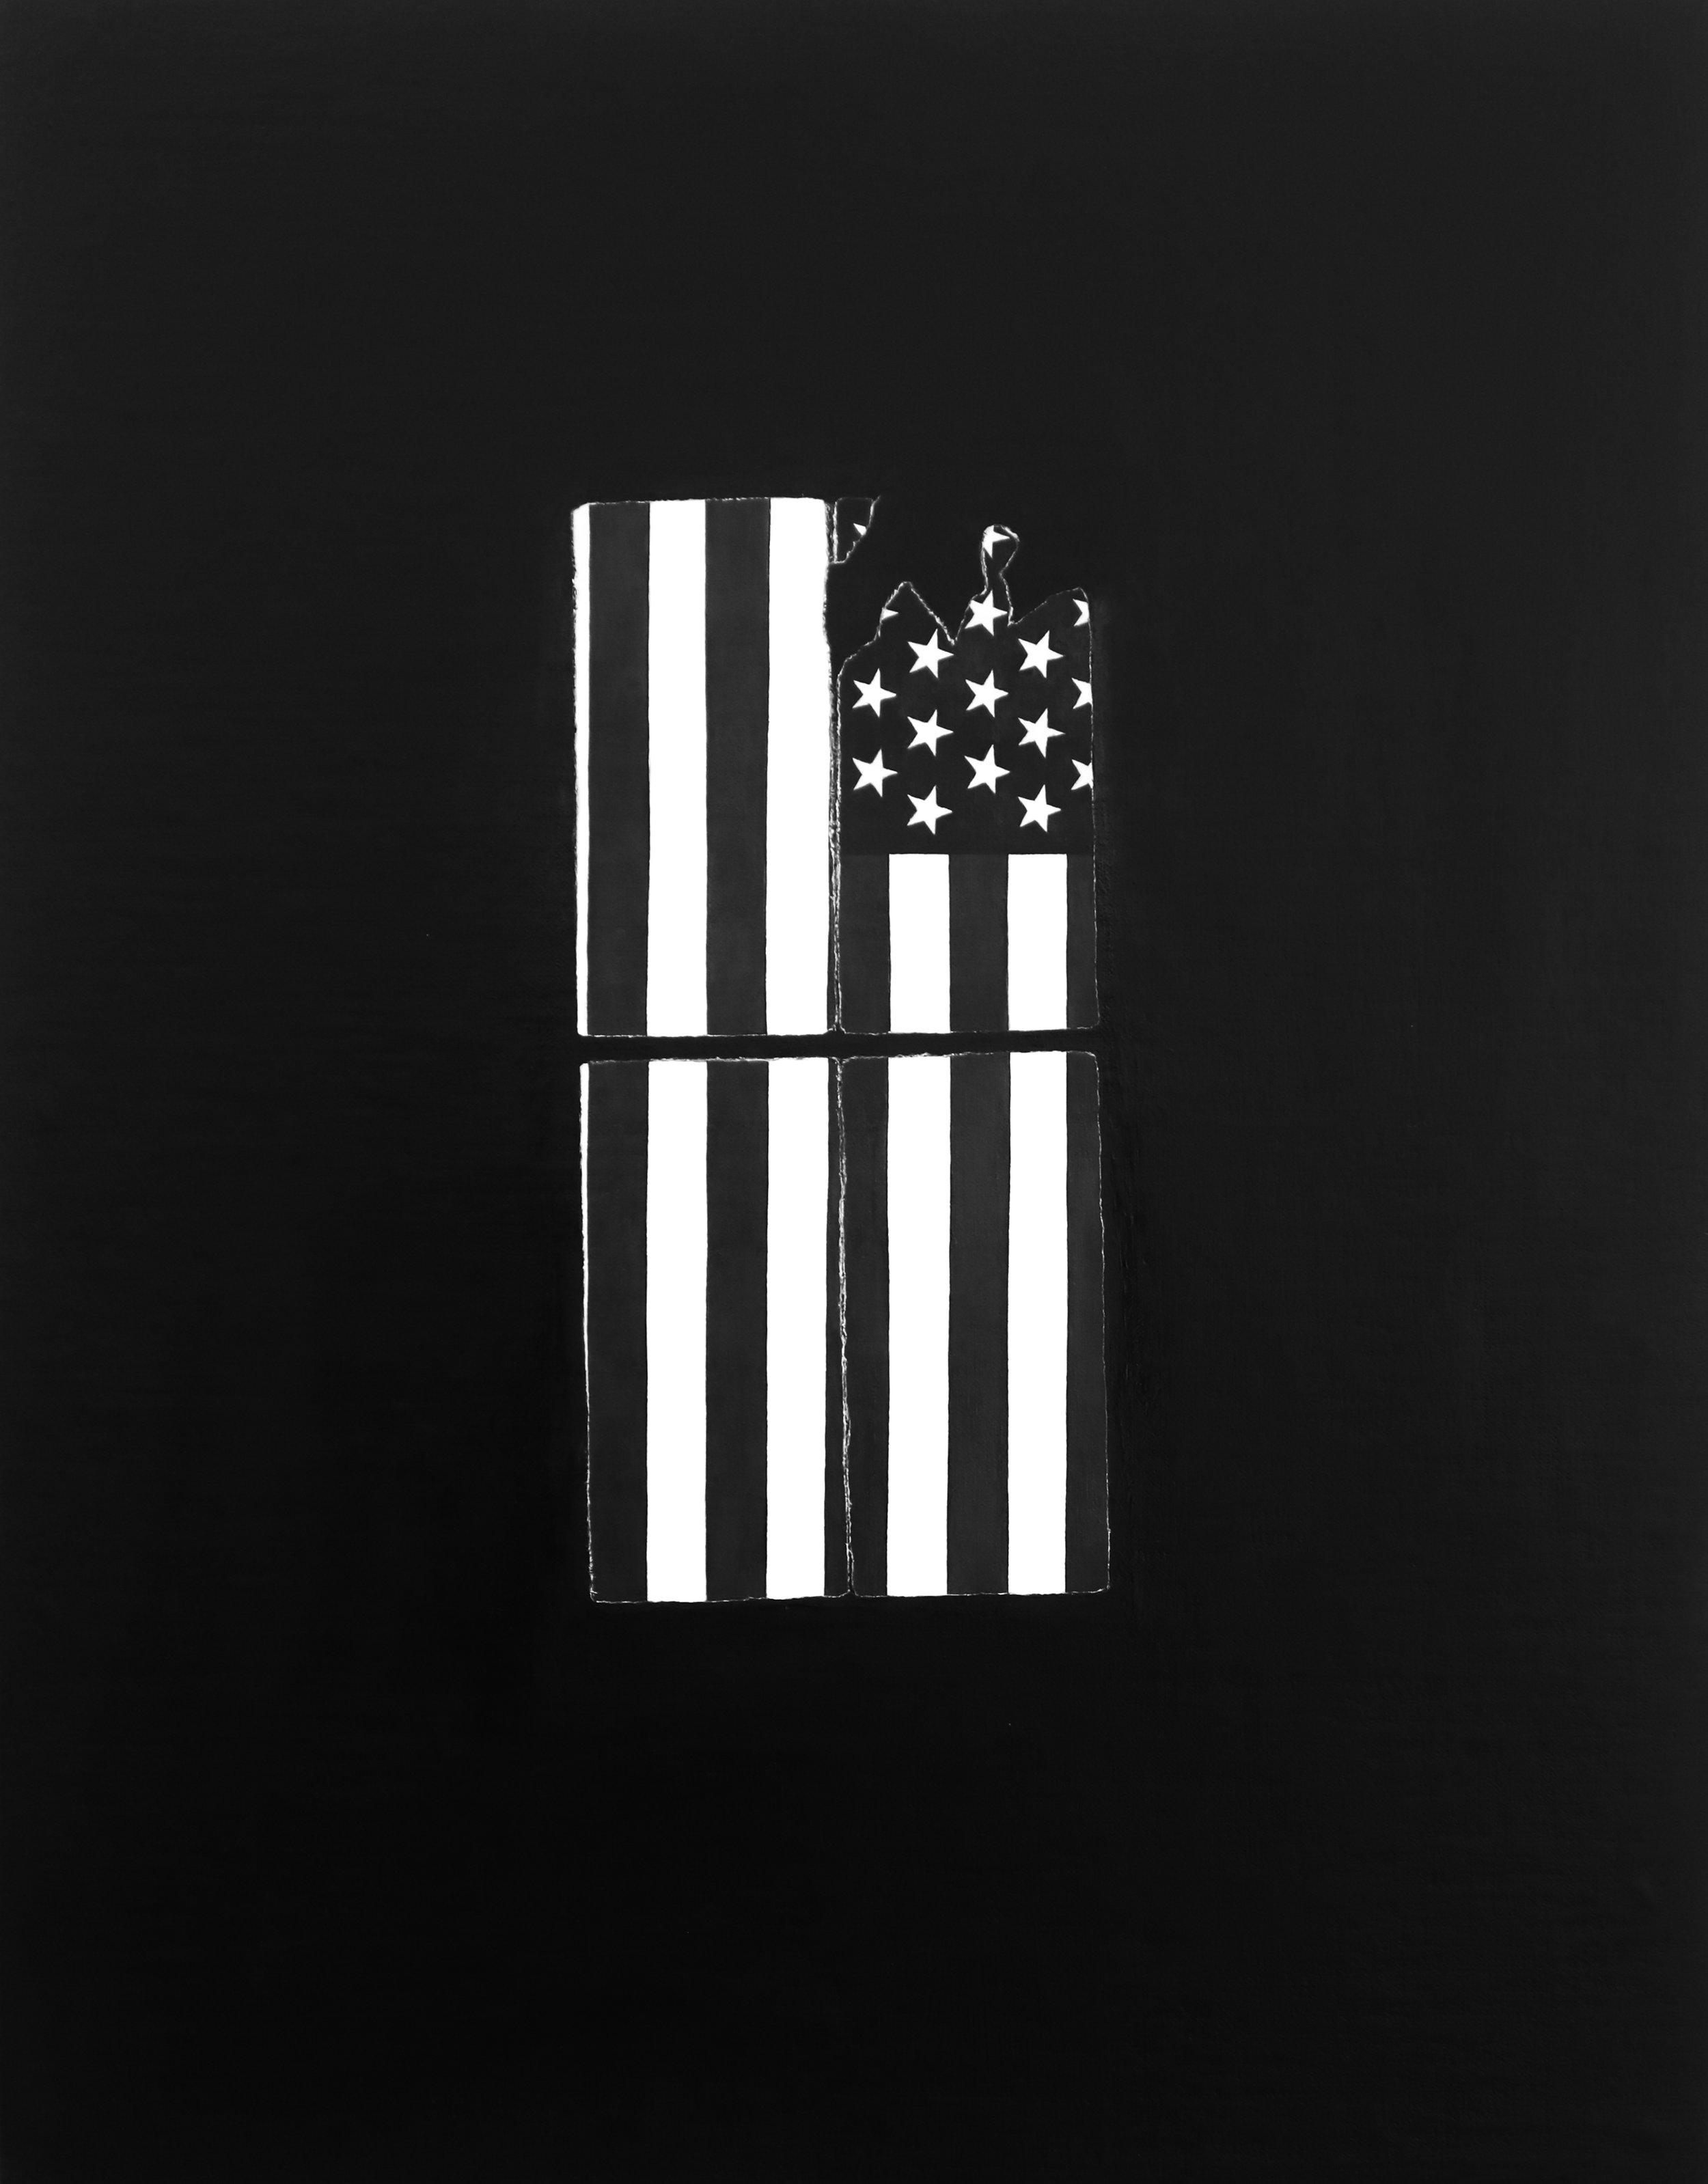 Alex Bierk,American Window, 2016,oil on linen, over panel, 17.5 x 13.75 inches